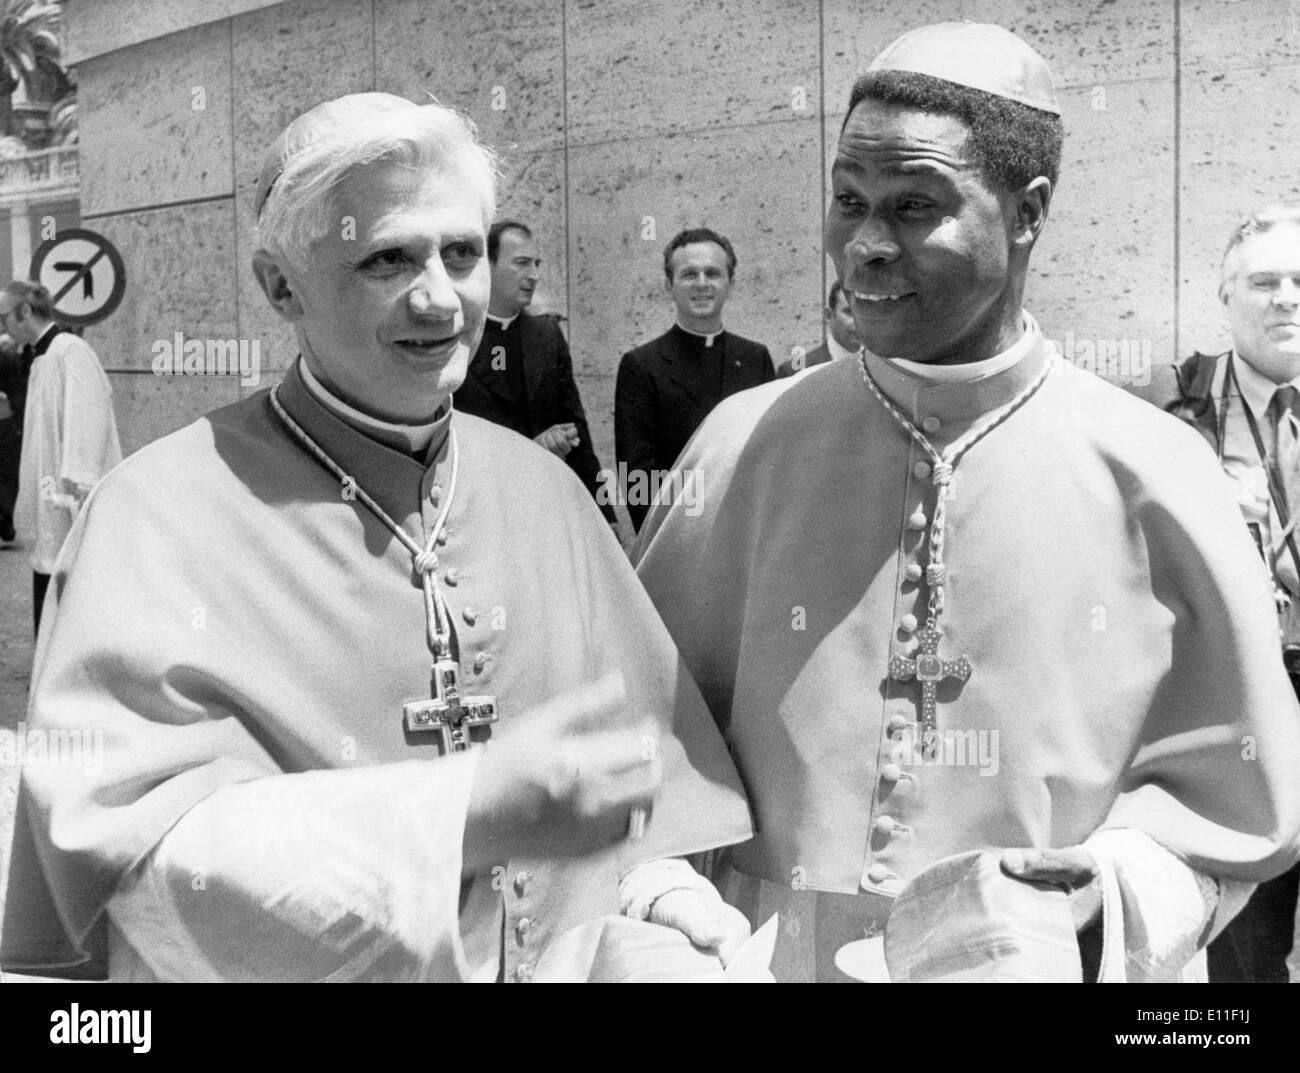 5543635 (9003107) Joseph RATZINGER, deutscher Kardinal (li.) und Bernardin GANTIN, Kardinal aus Dahomey, im Gespr‰ch Stock Photo